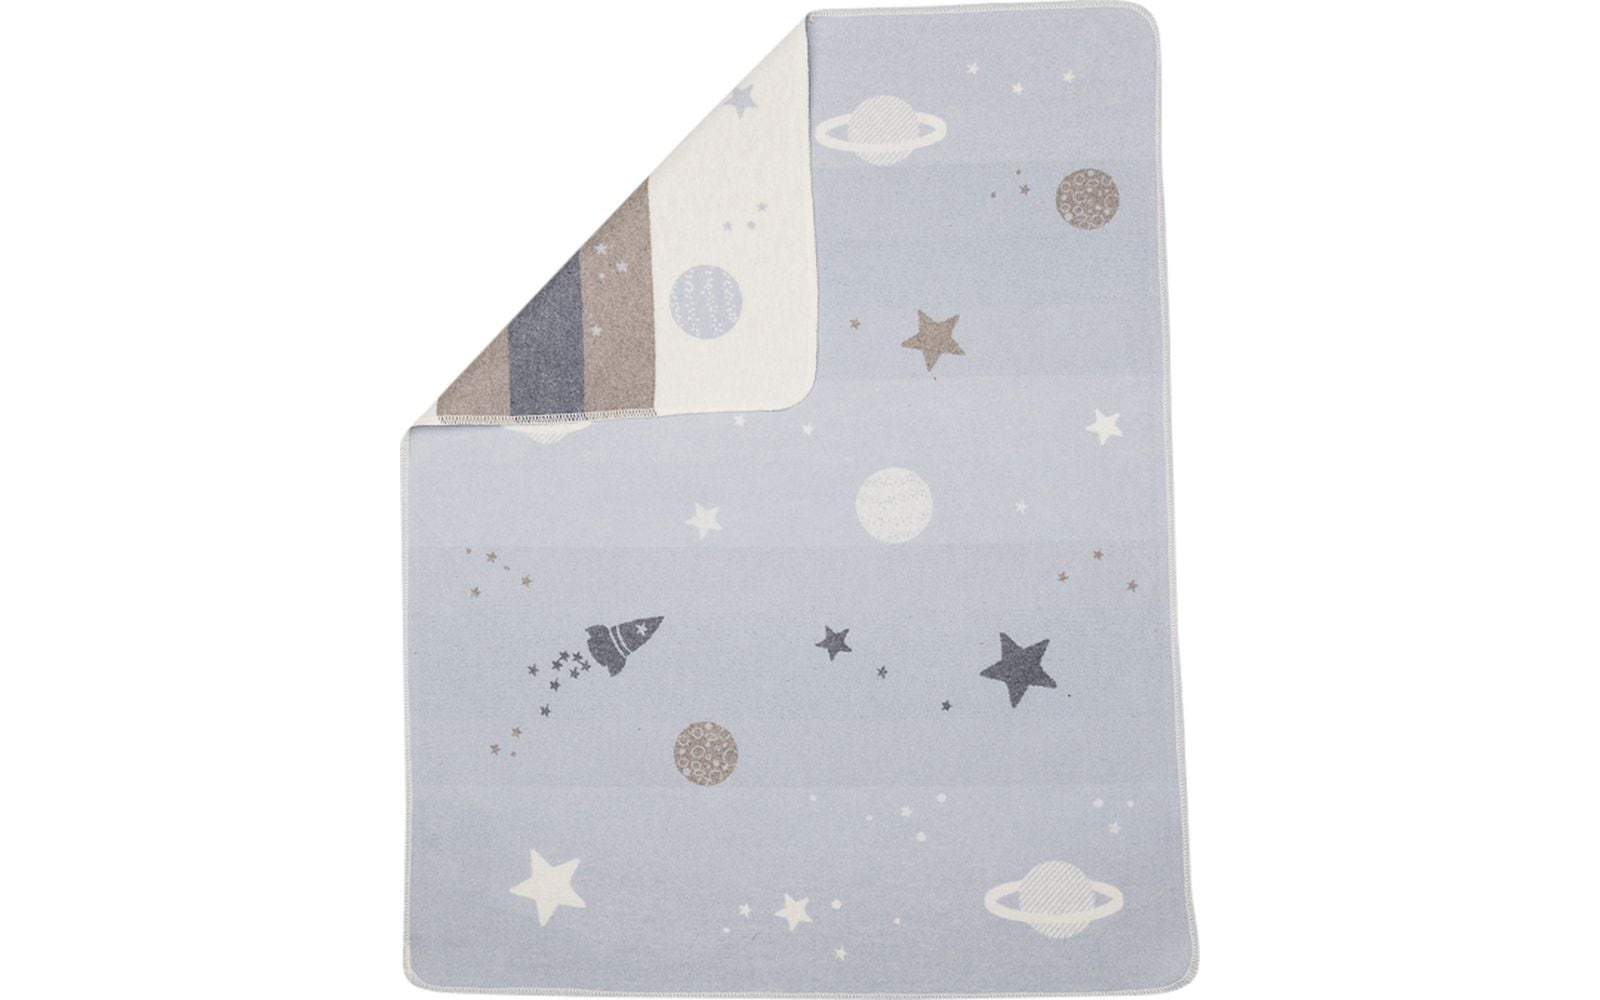 Blanket - Planets - Blue/Grey-1